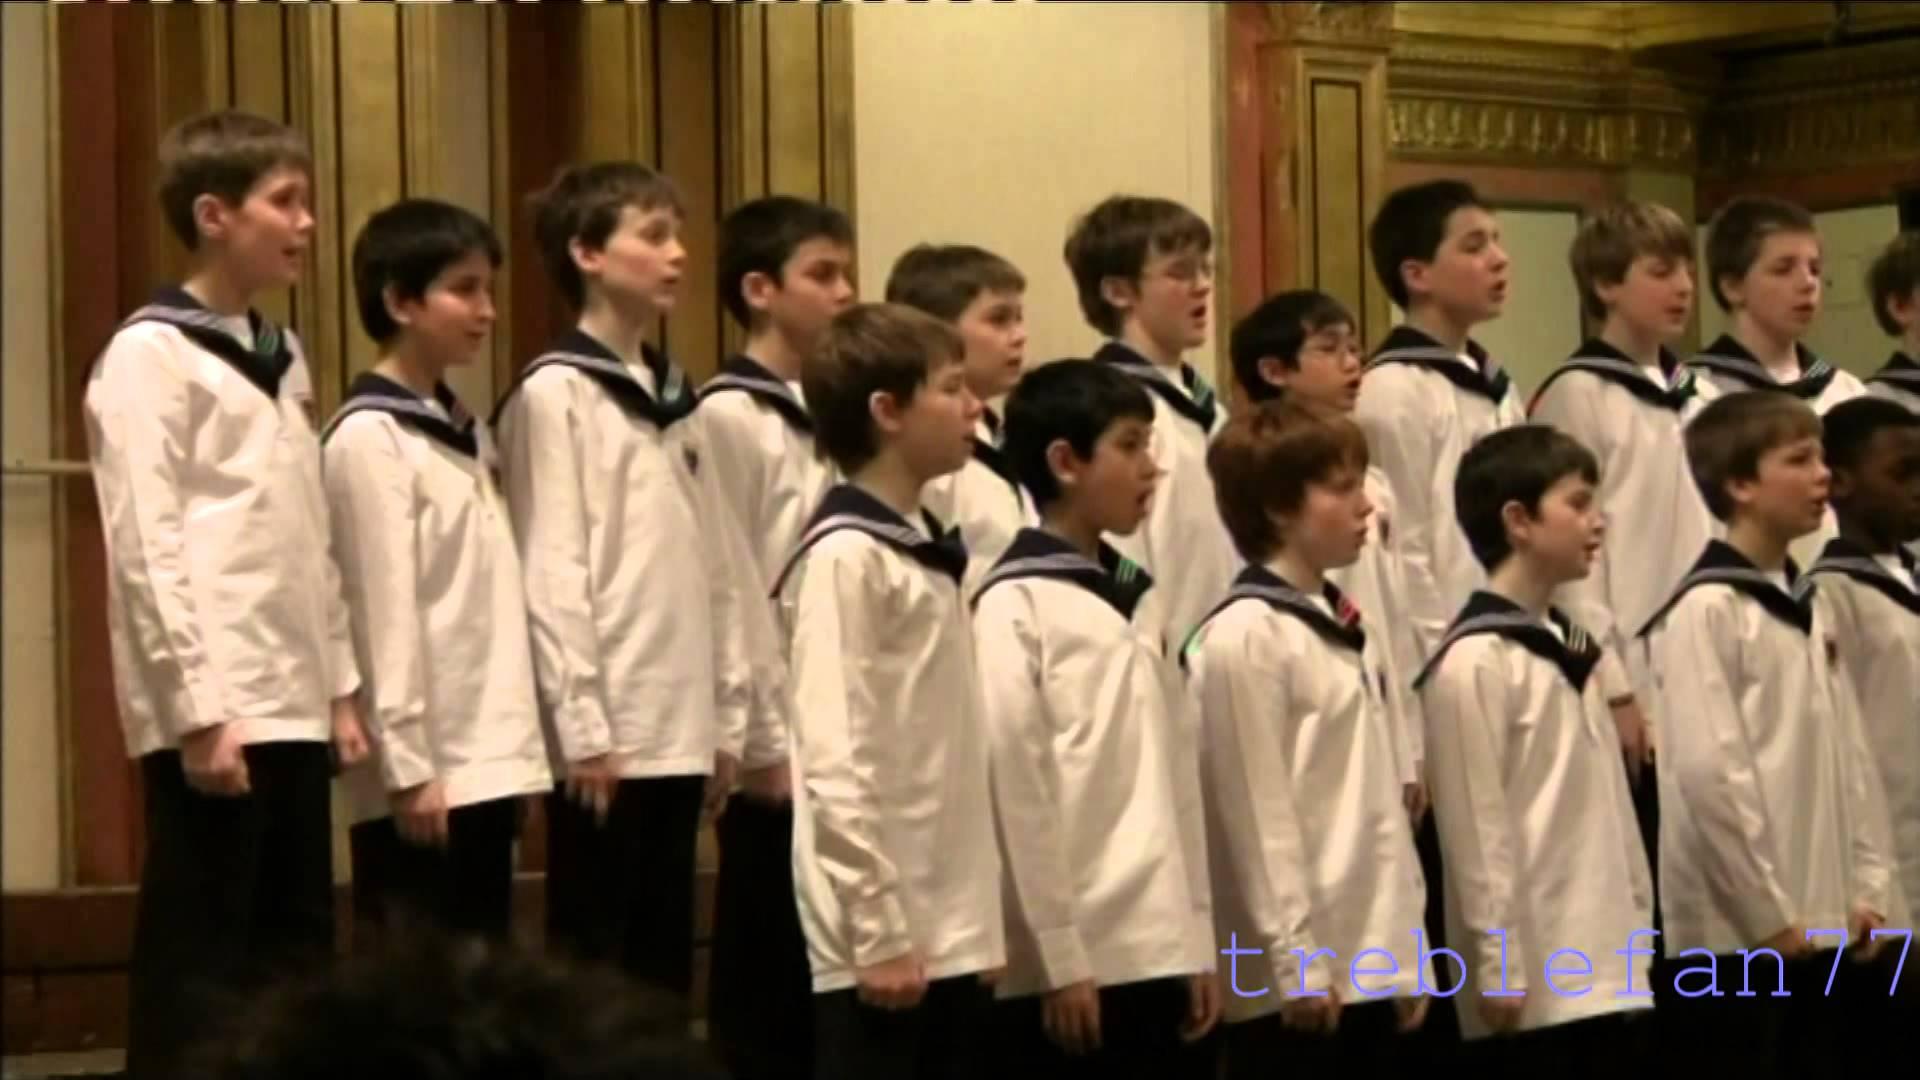 Vienna Boys´ Choir (March 17, 2009) Herbeck, Pueri concinete.